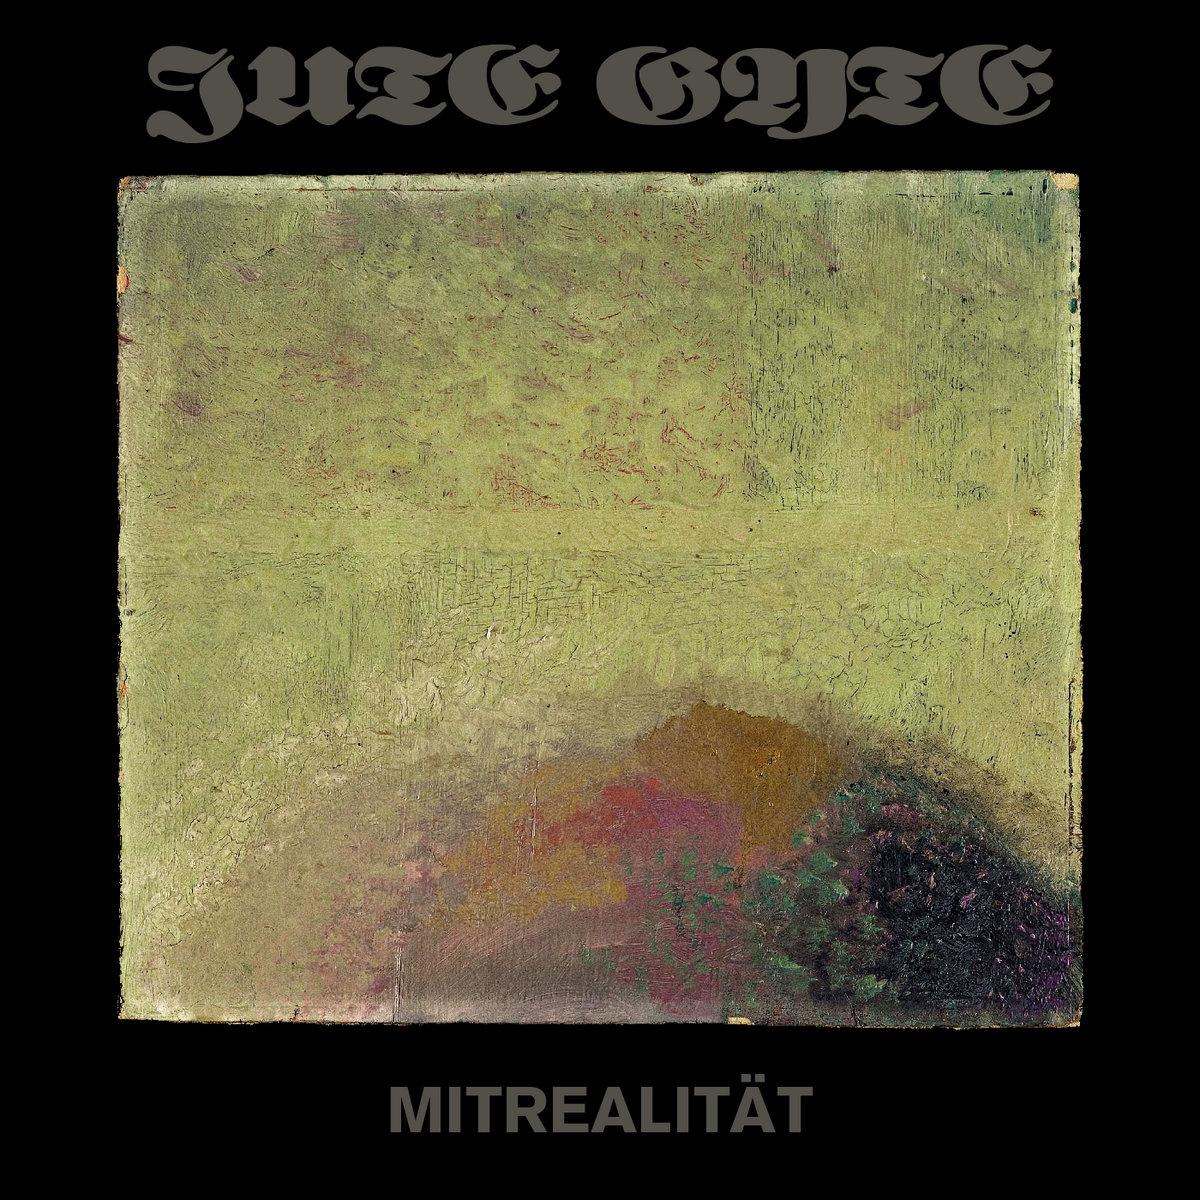 JUTE GYTE - Mitrealität cover